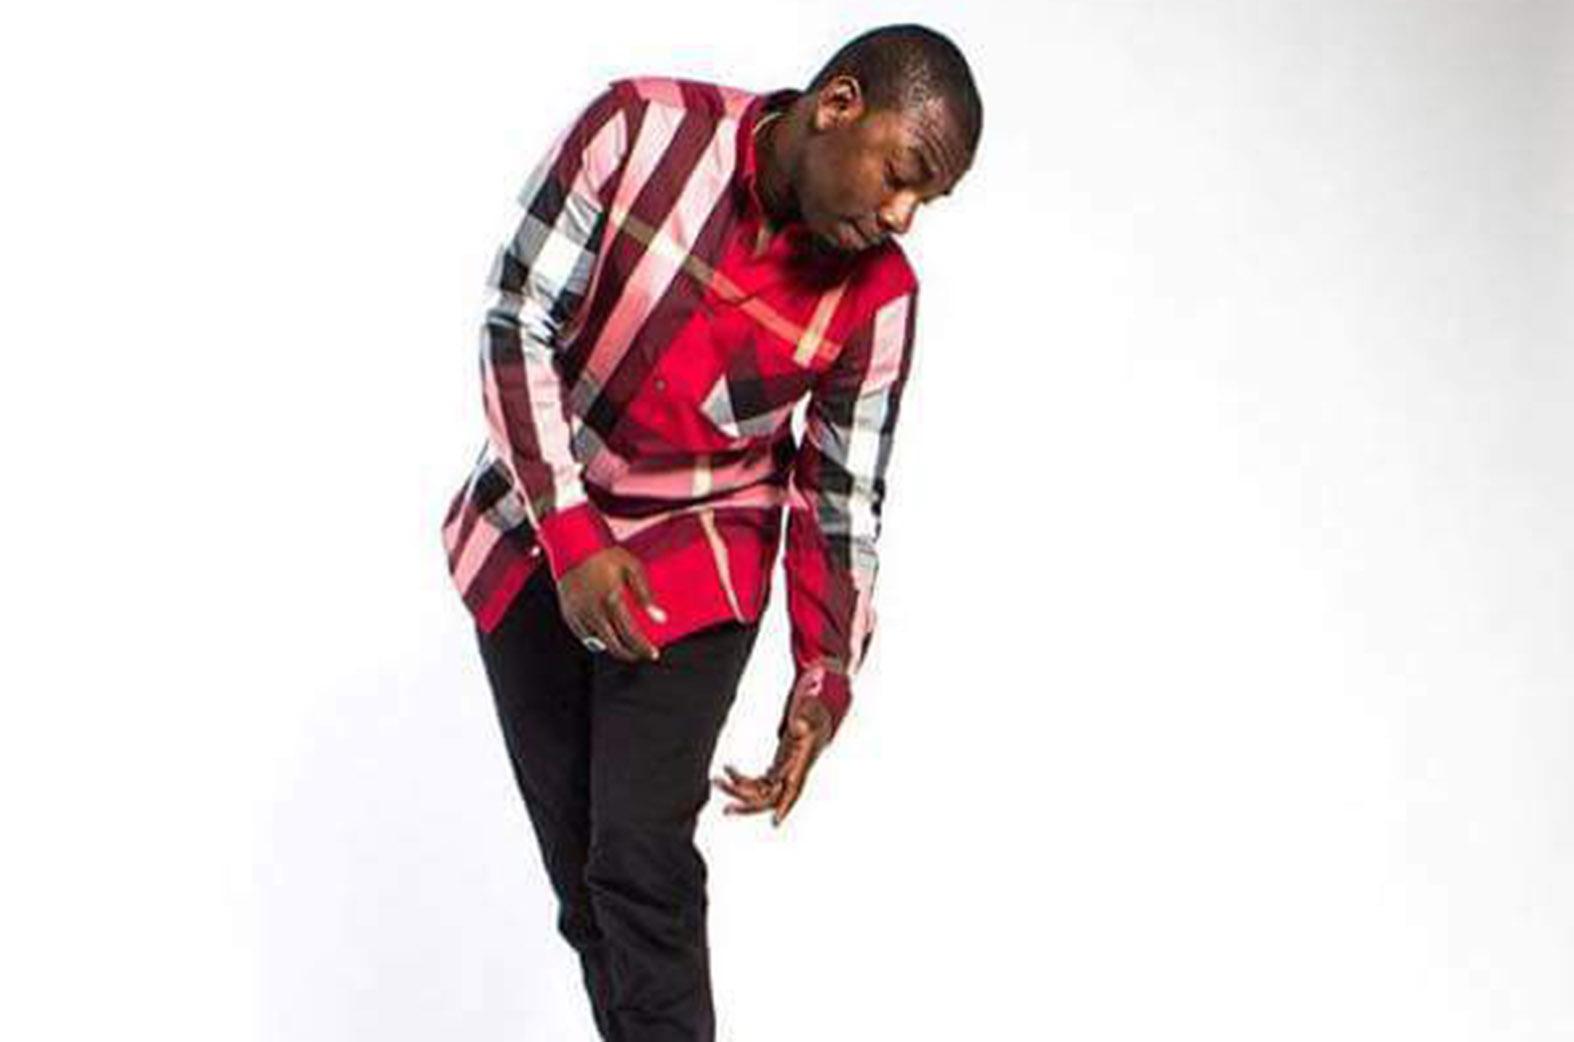 Meet Wayo, politician Kofi Wayo's son and singer of Champion Banana